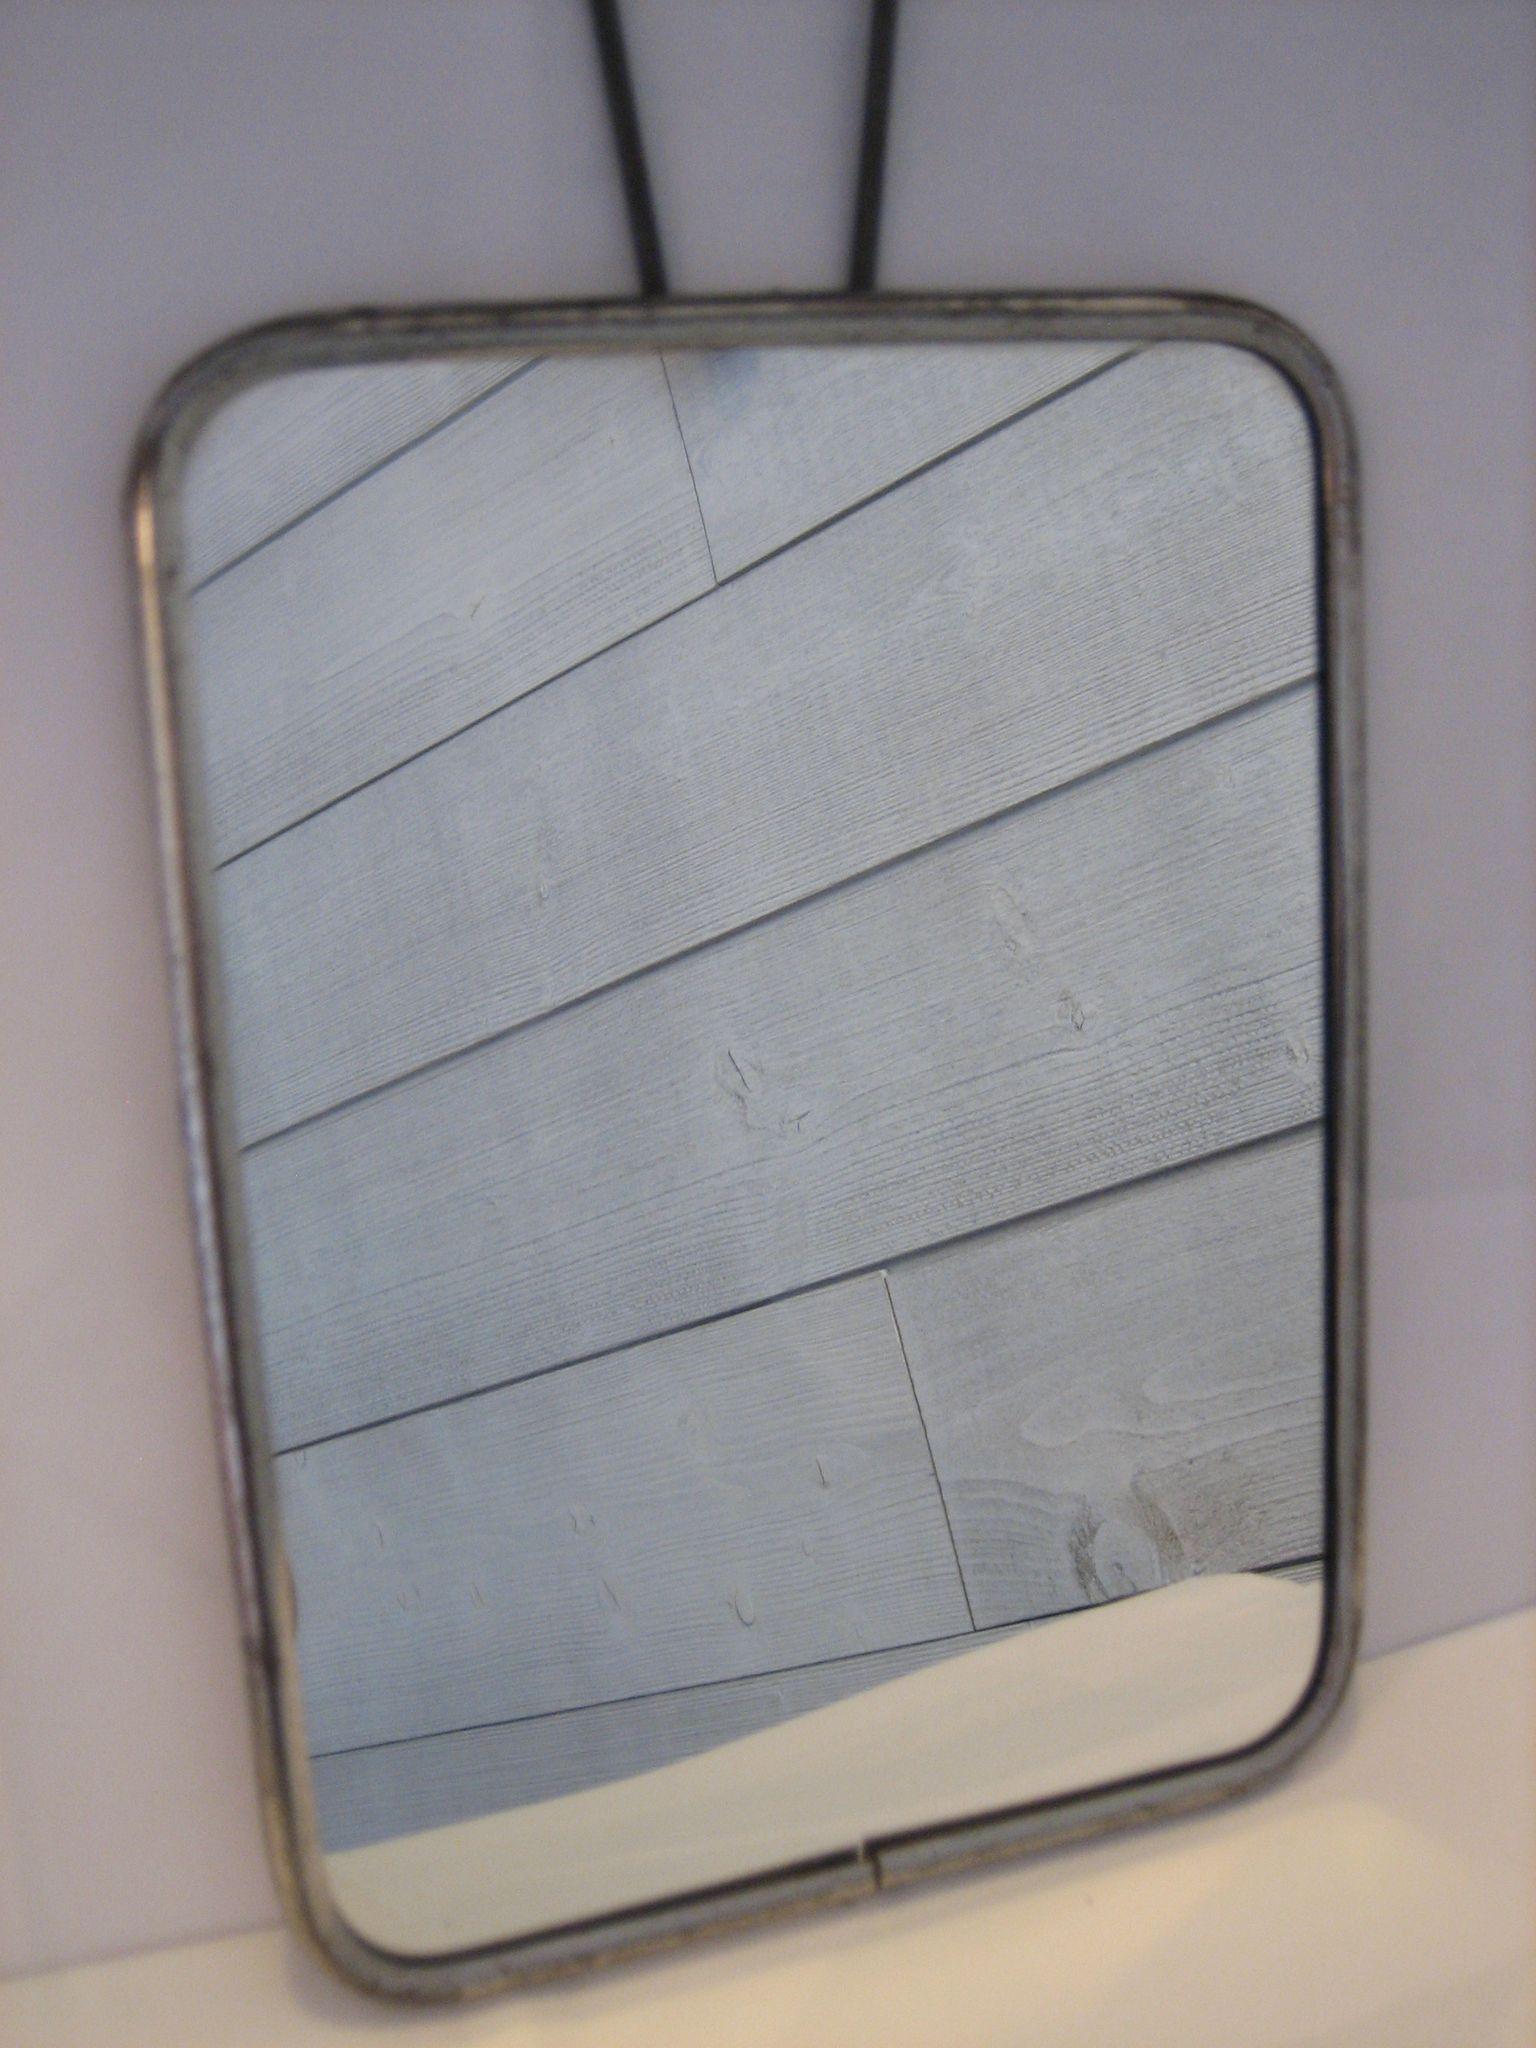 Miroir mon beau miroir lilicabane for Miroir mon beau miroir